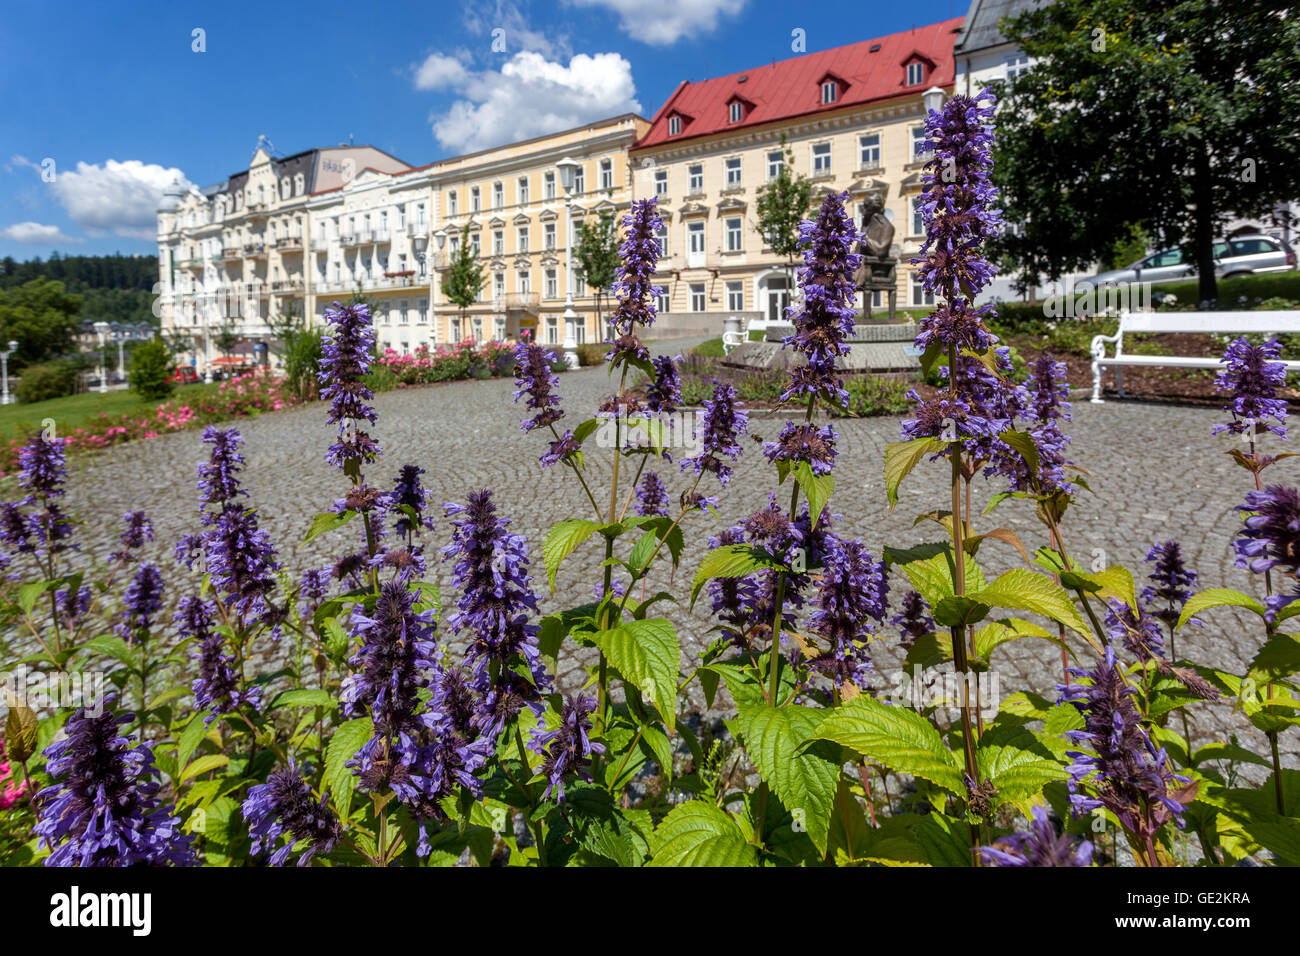 Goethe Square, Marianske Lazne, Czech Spa town, Czech Republic - Stock Image